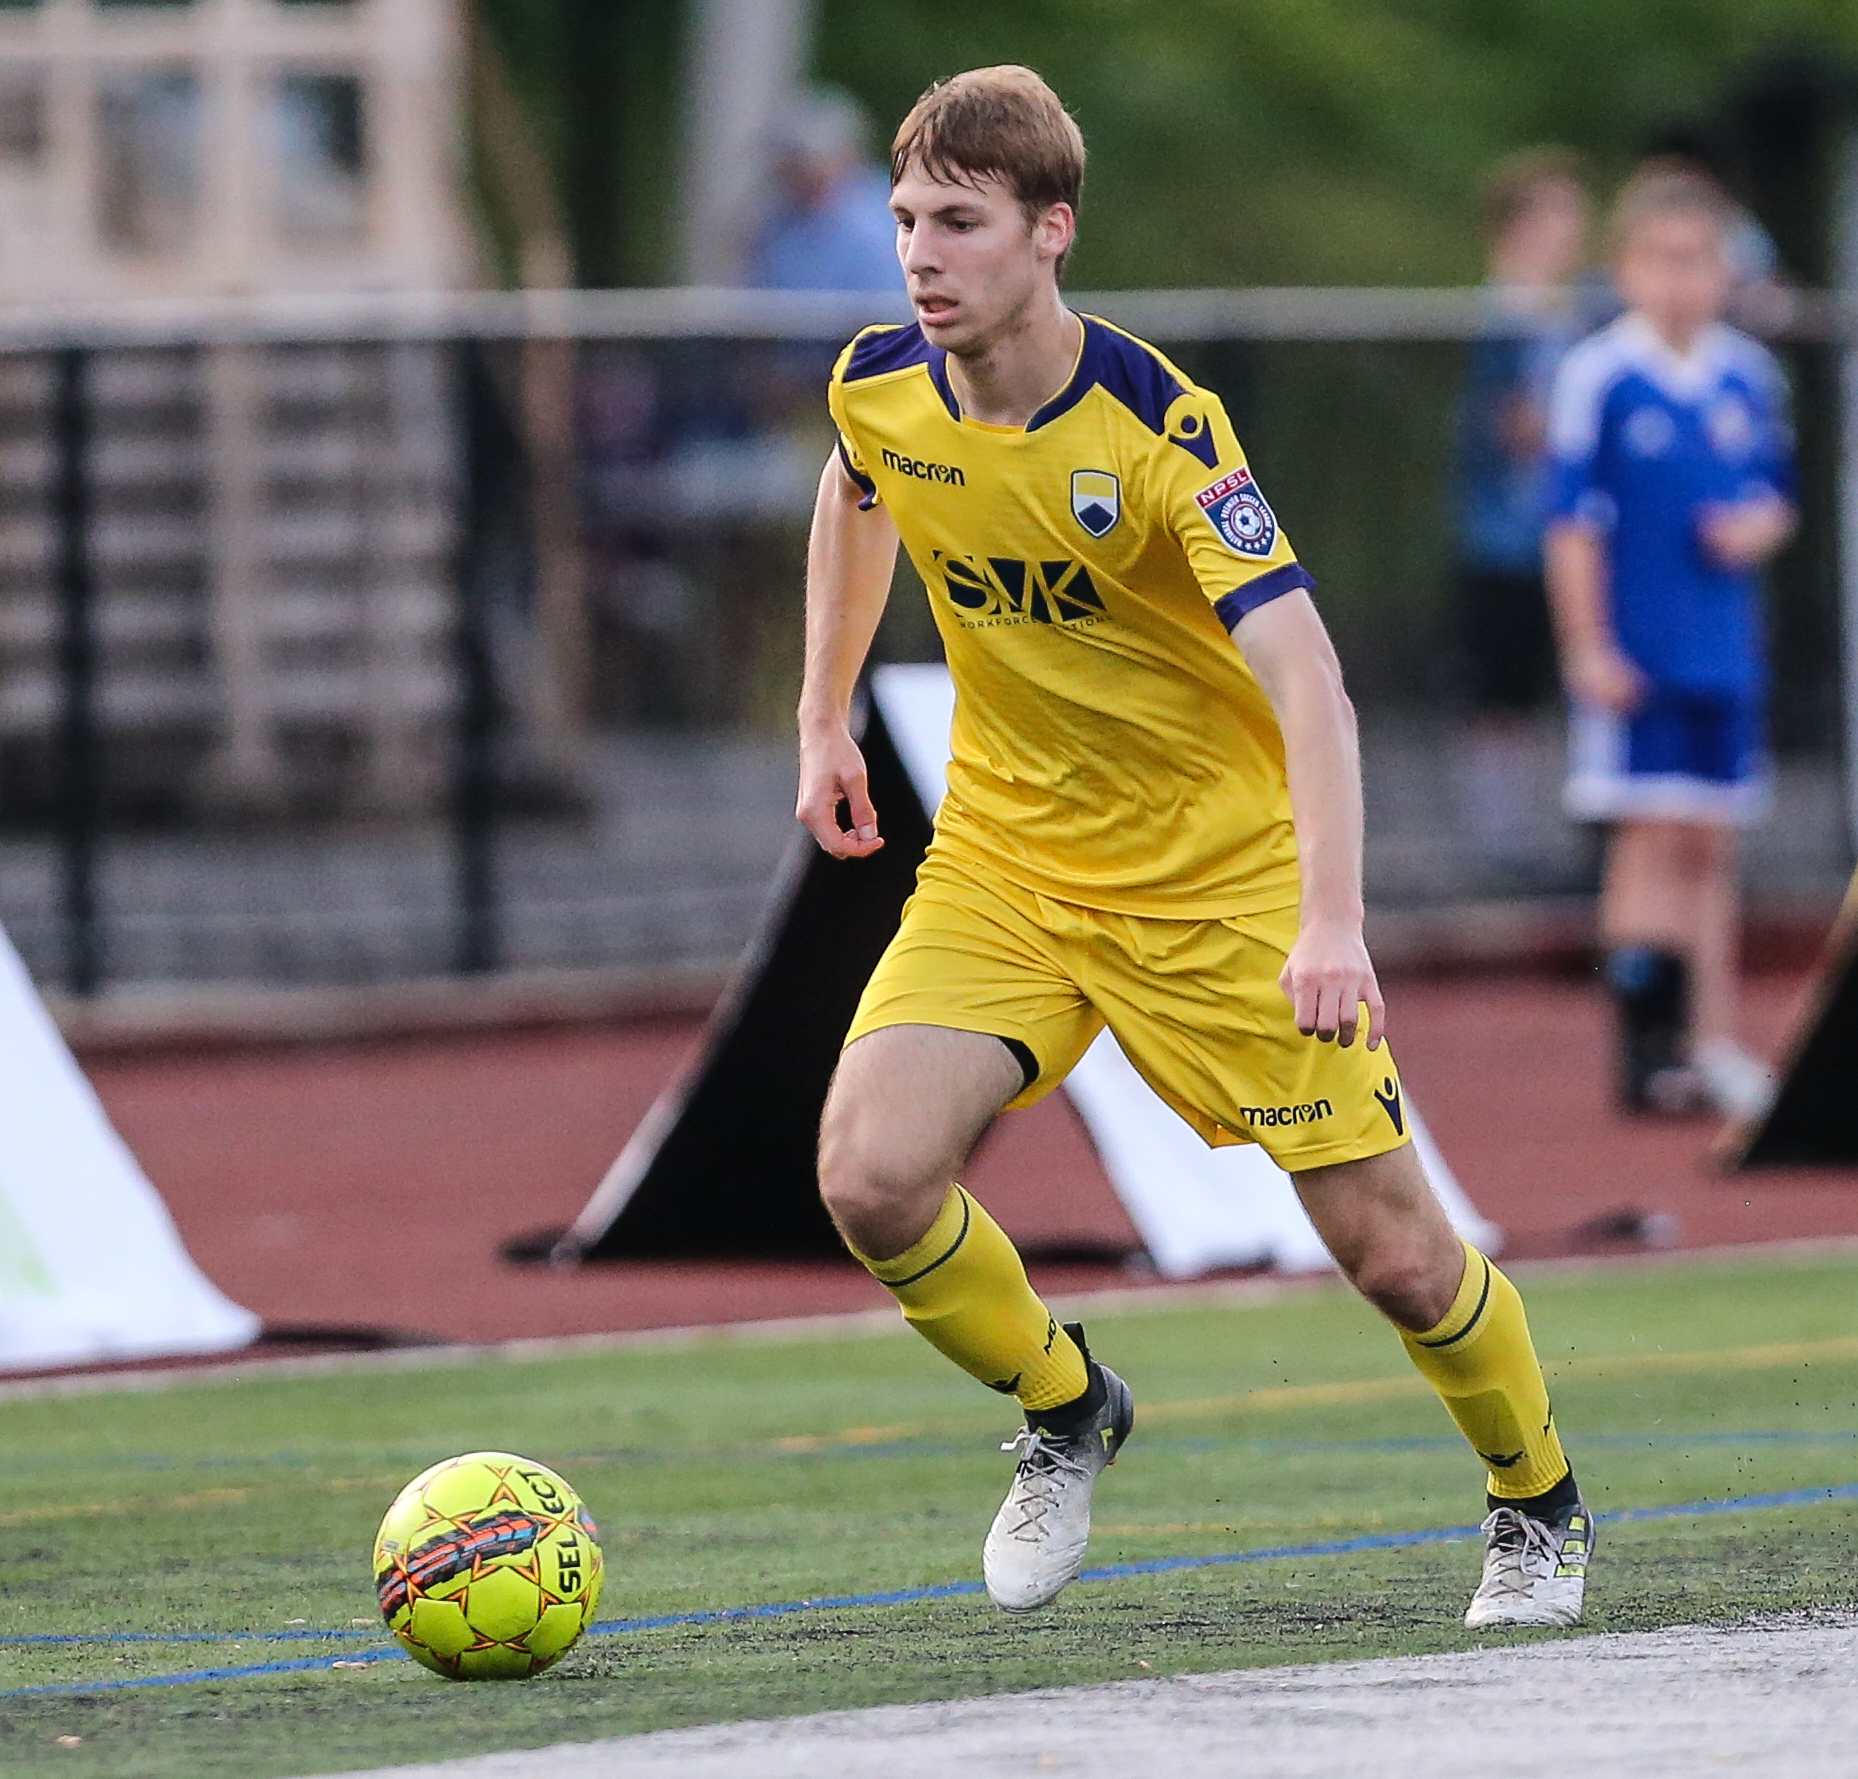 Matt Thorsheim in action against NJ Copa FC